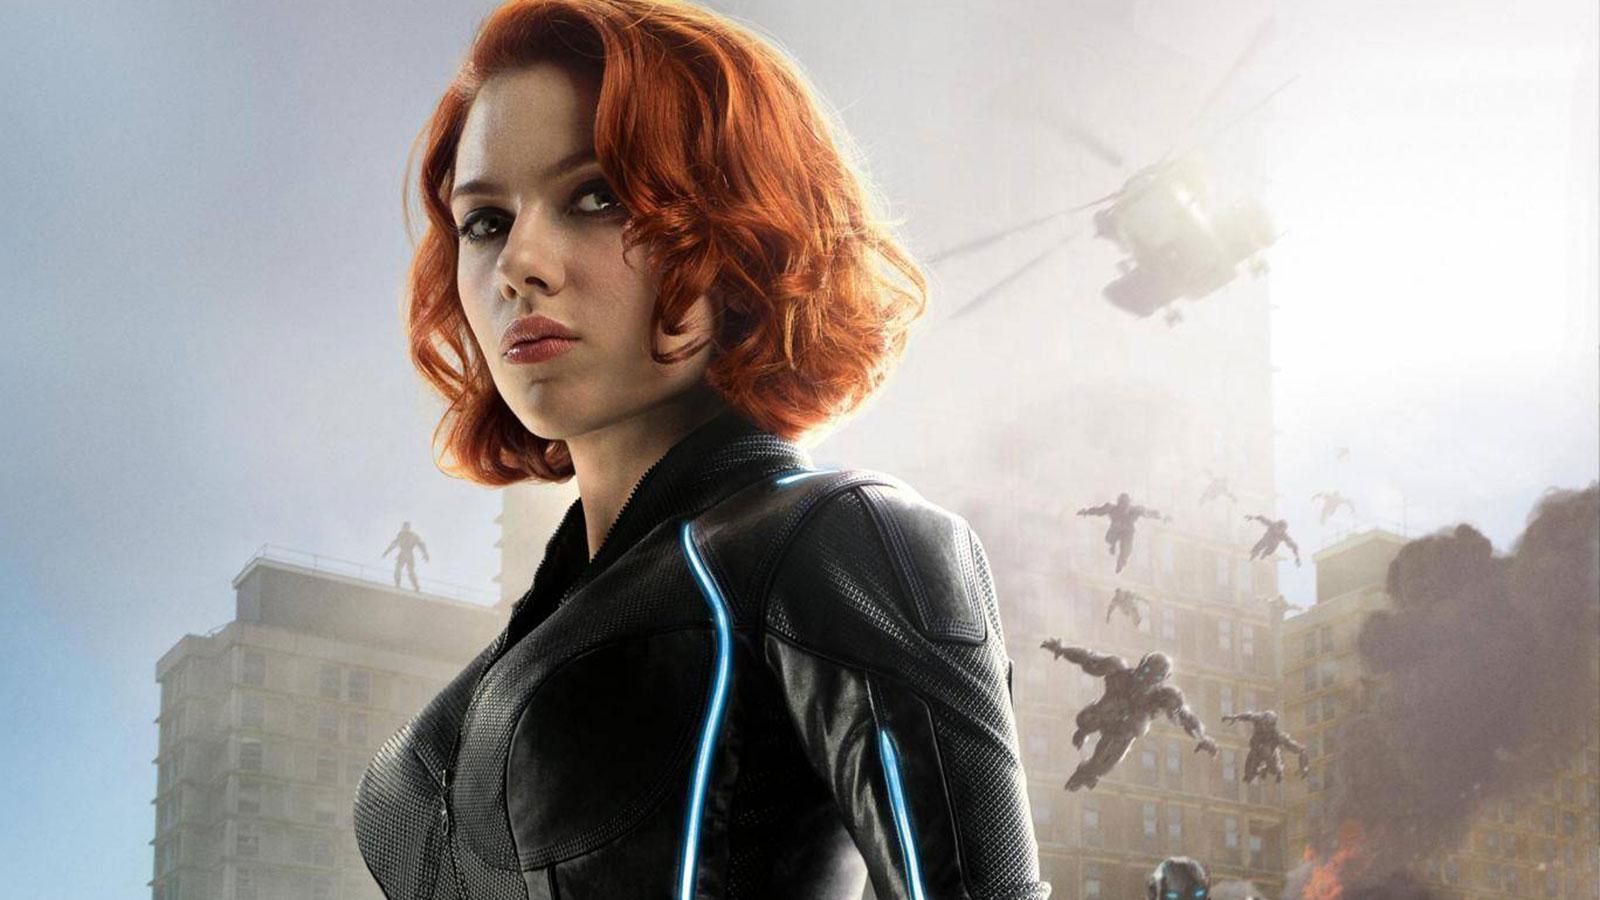 black-widow-cambio-look-avengers-infinity-war-scarlett-johansson.jpg